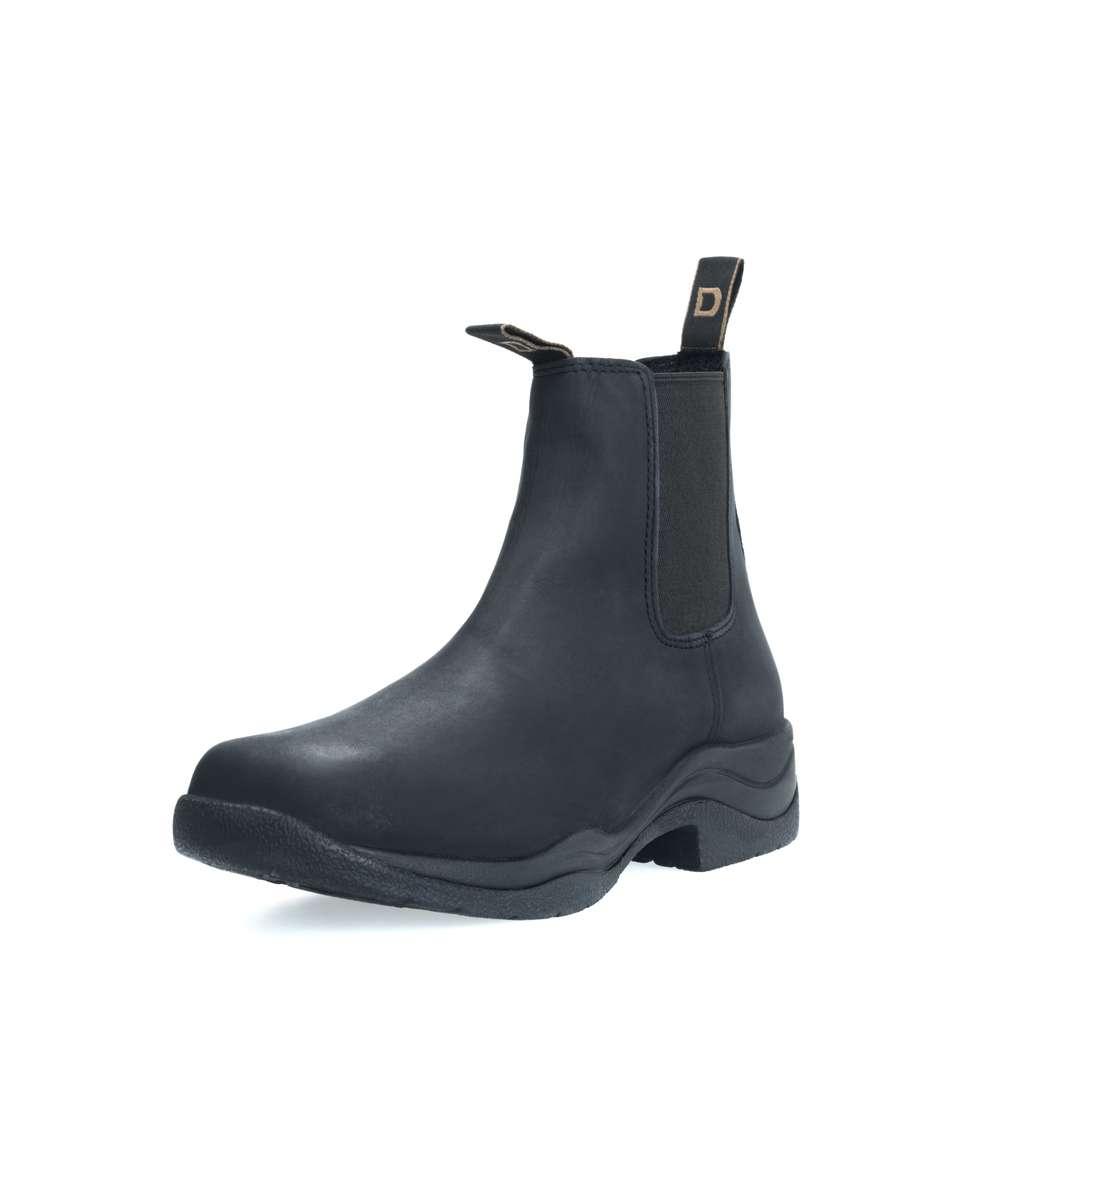 b64a866428d Details about Dublin Venturer Boots Waterproof Redskin Leather Rider  Comfort System